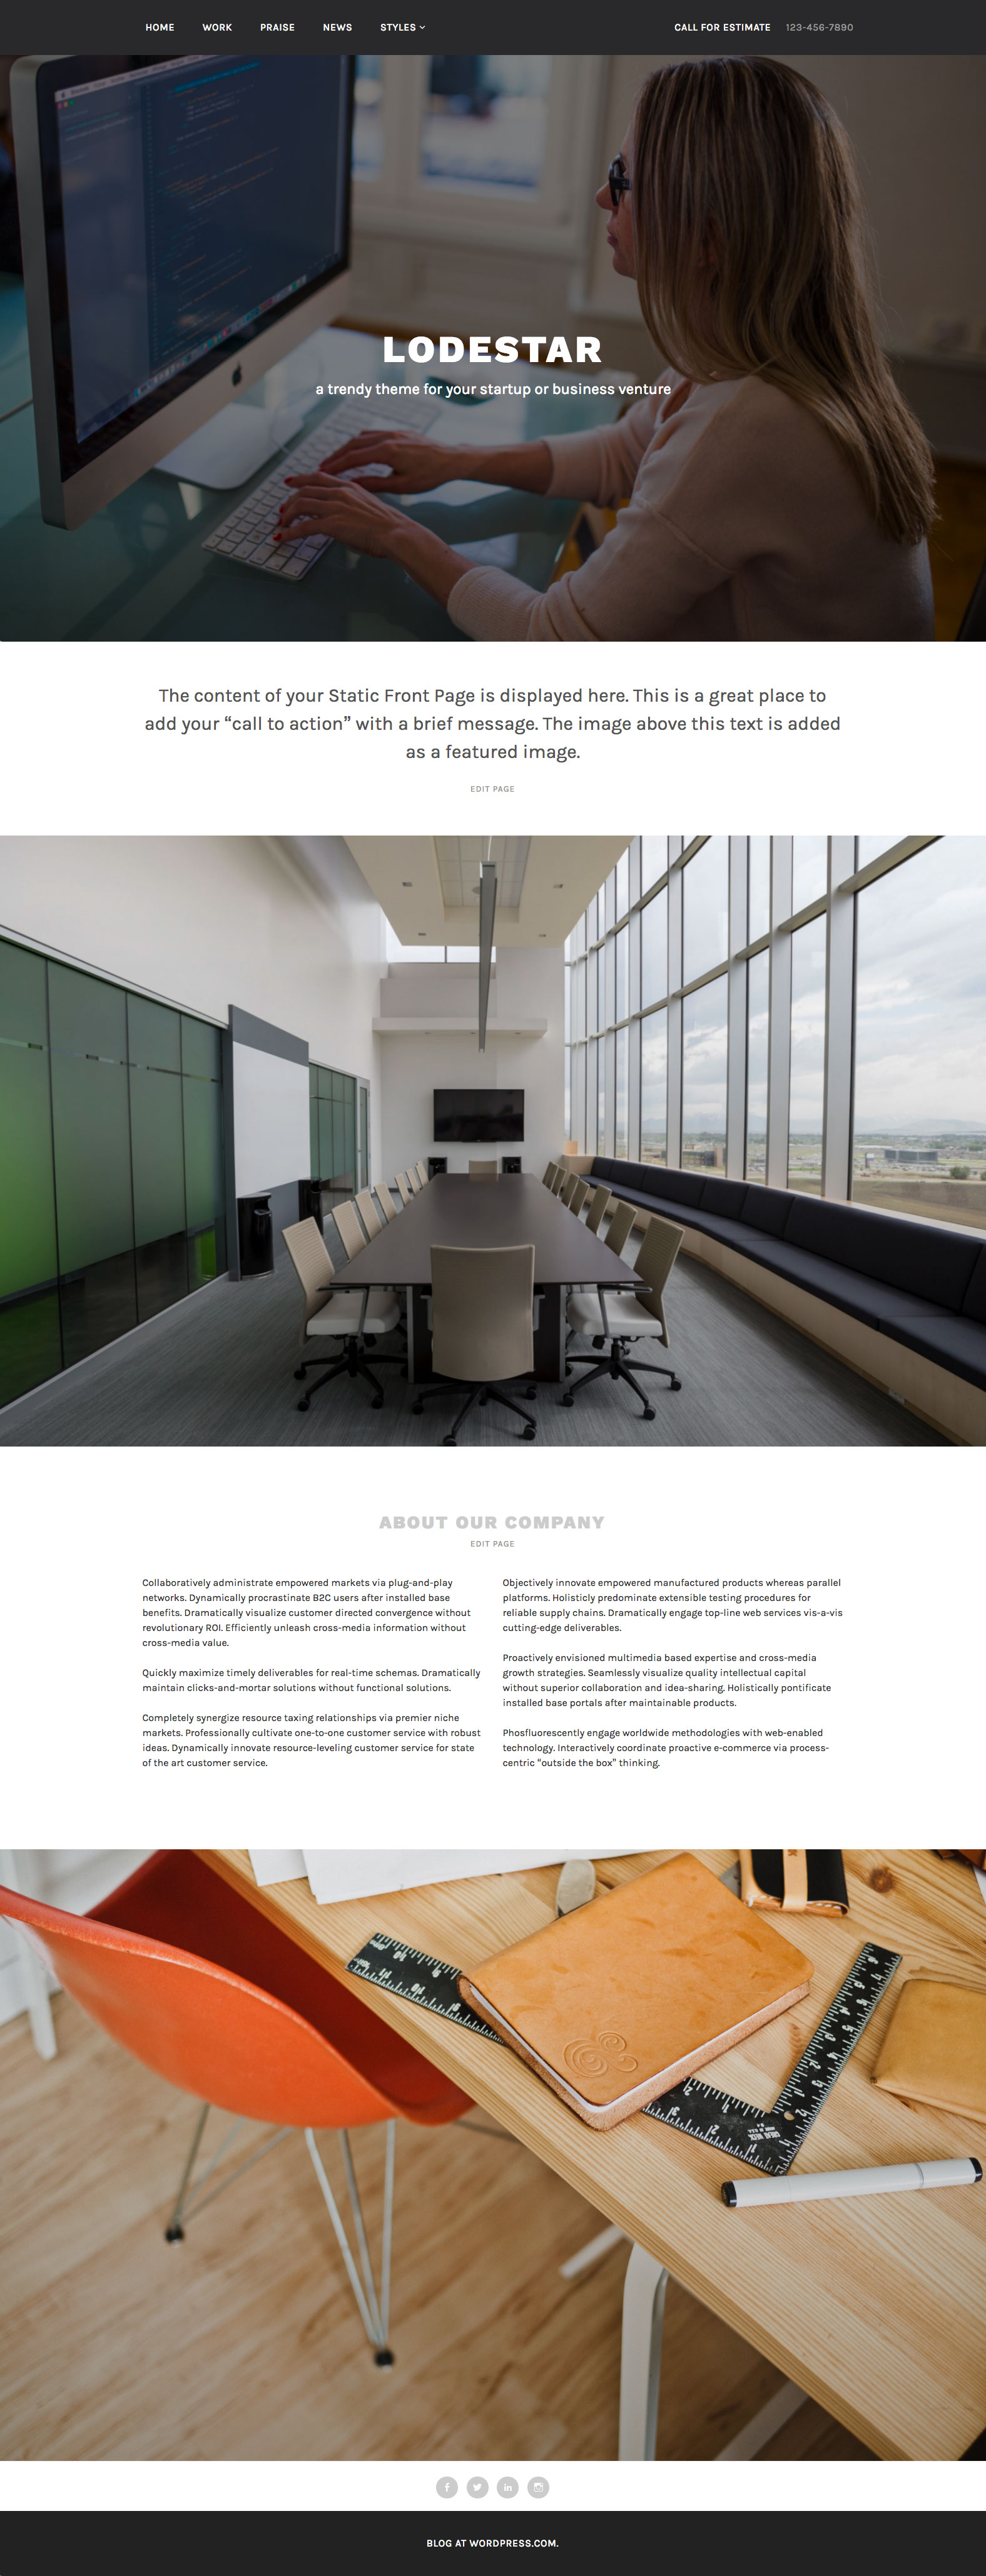 lodestar-full-design-featured-showcase